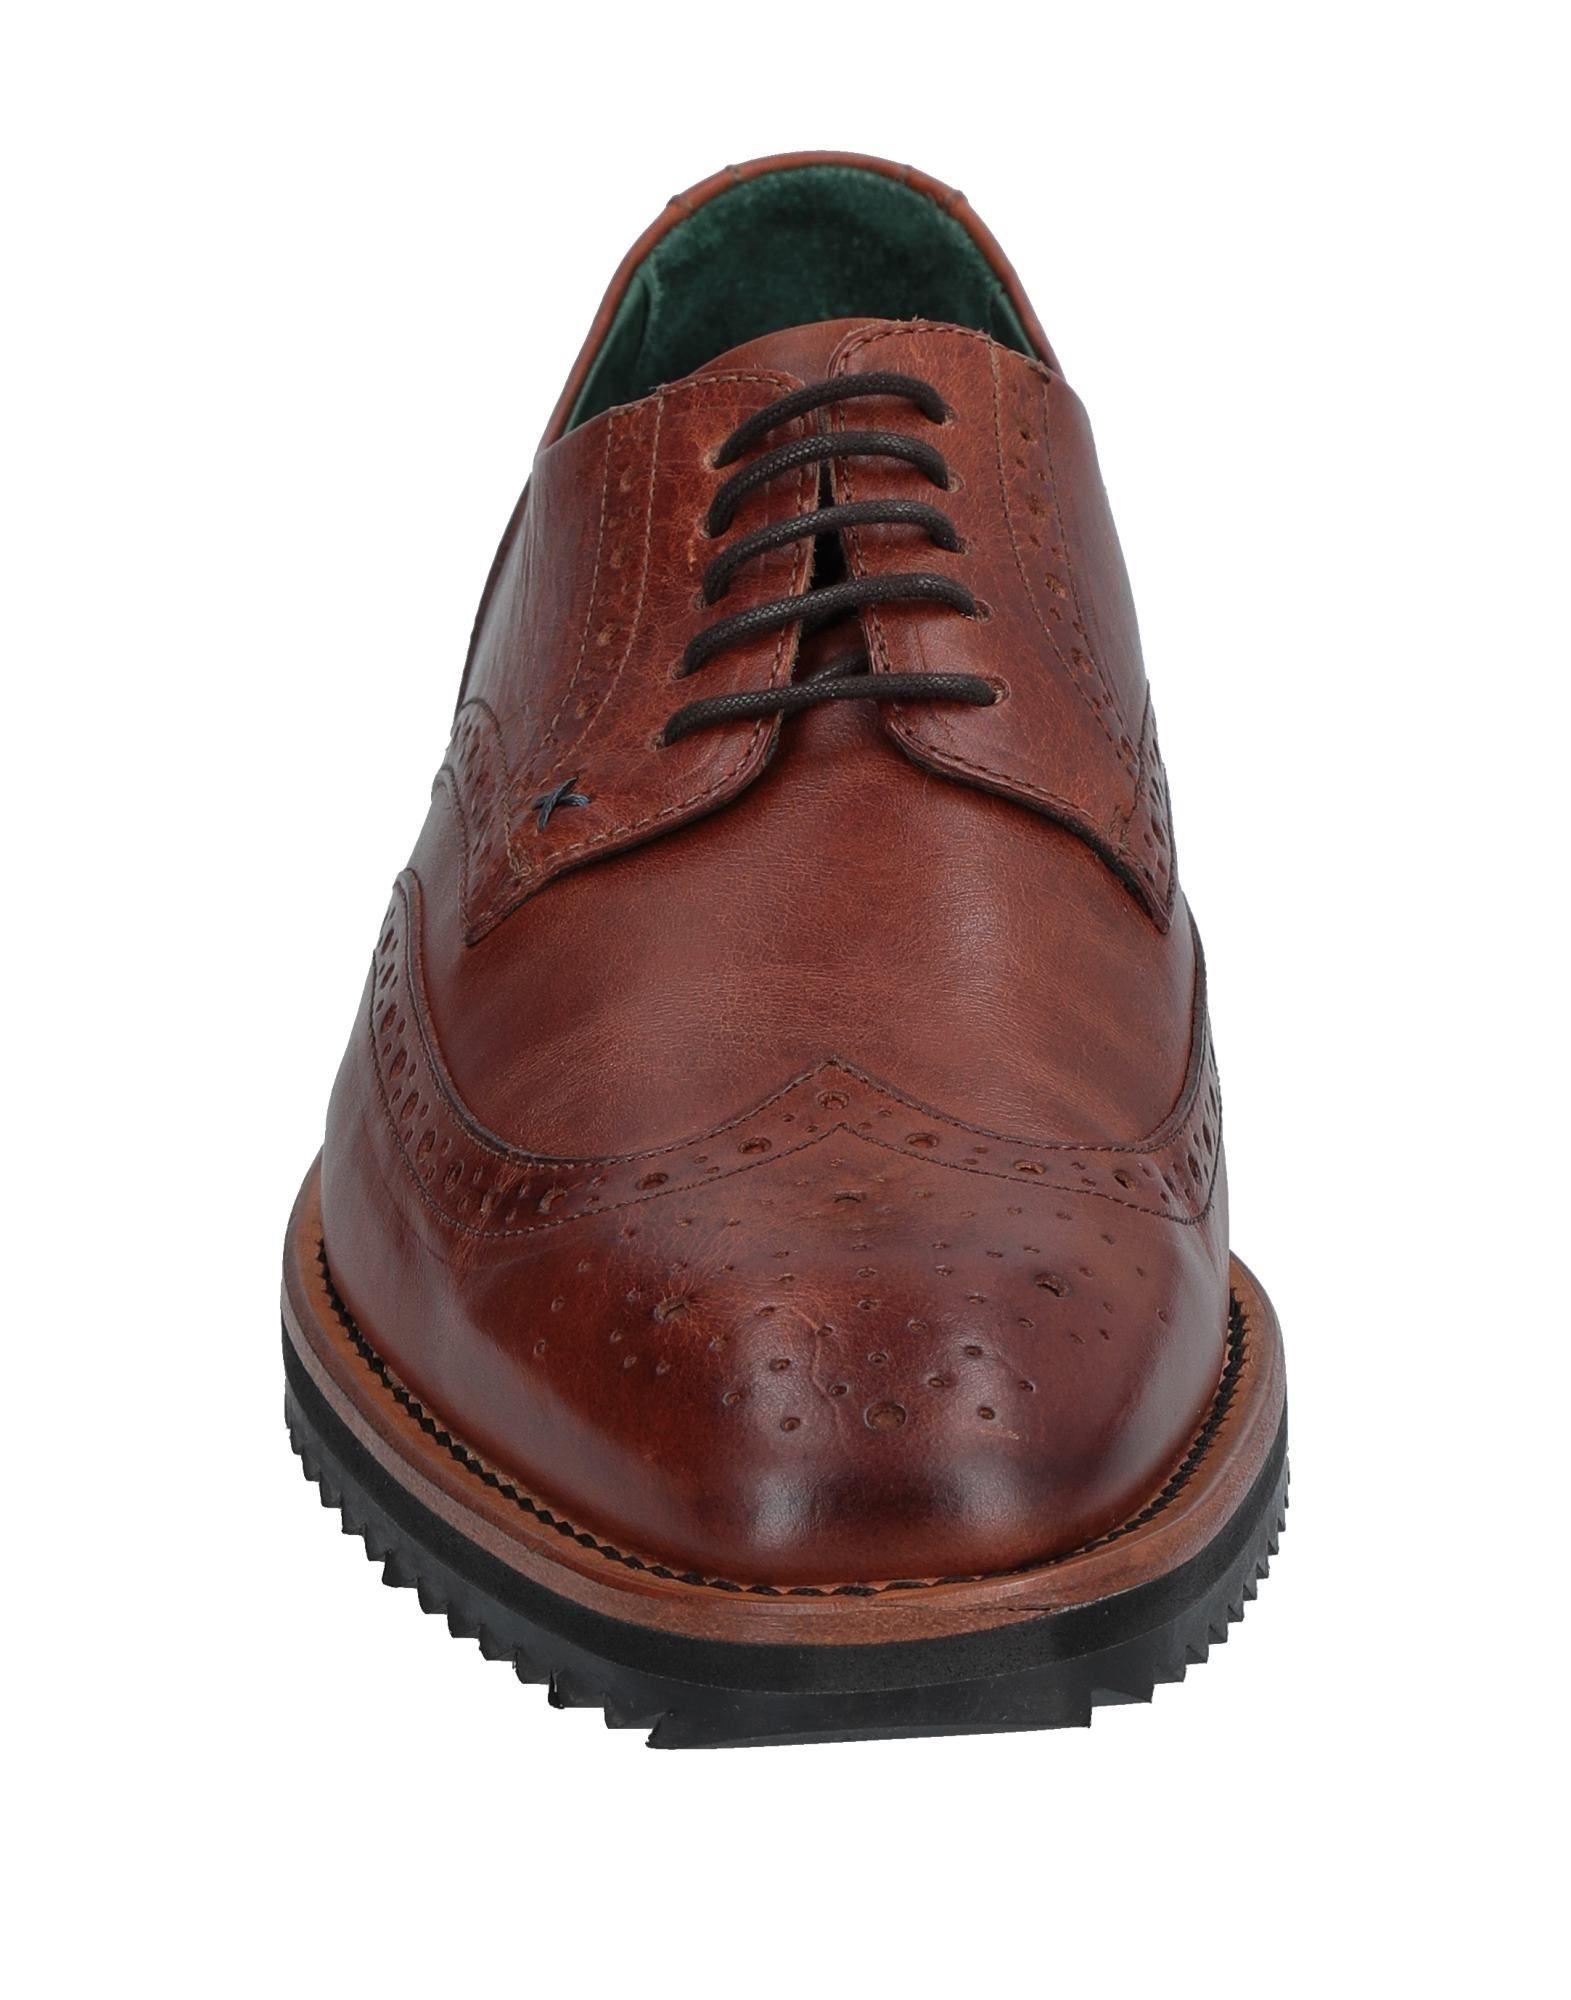 Rabatt echte Schnürschuhe Schuhe Exceed Schnürschuhe echte Herren  11521645TW be3293